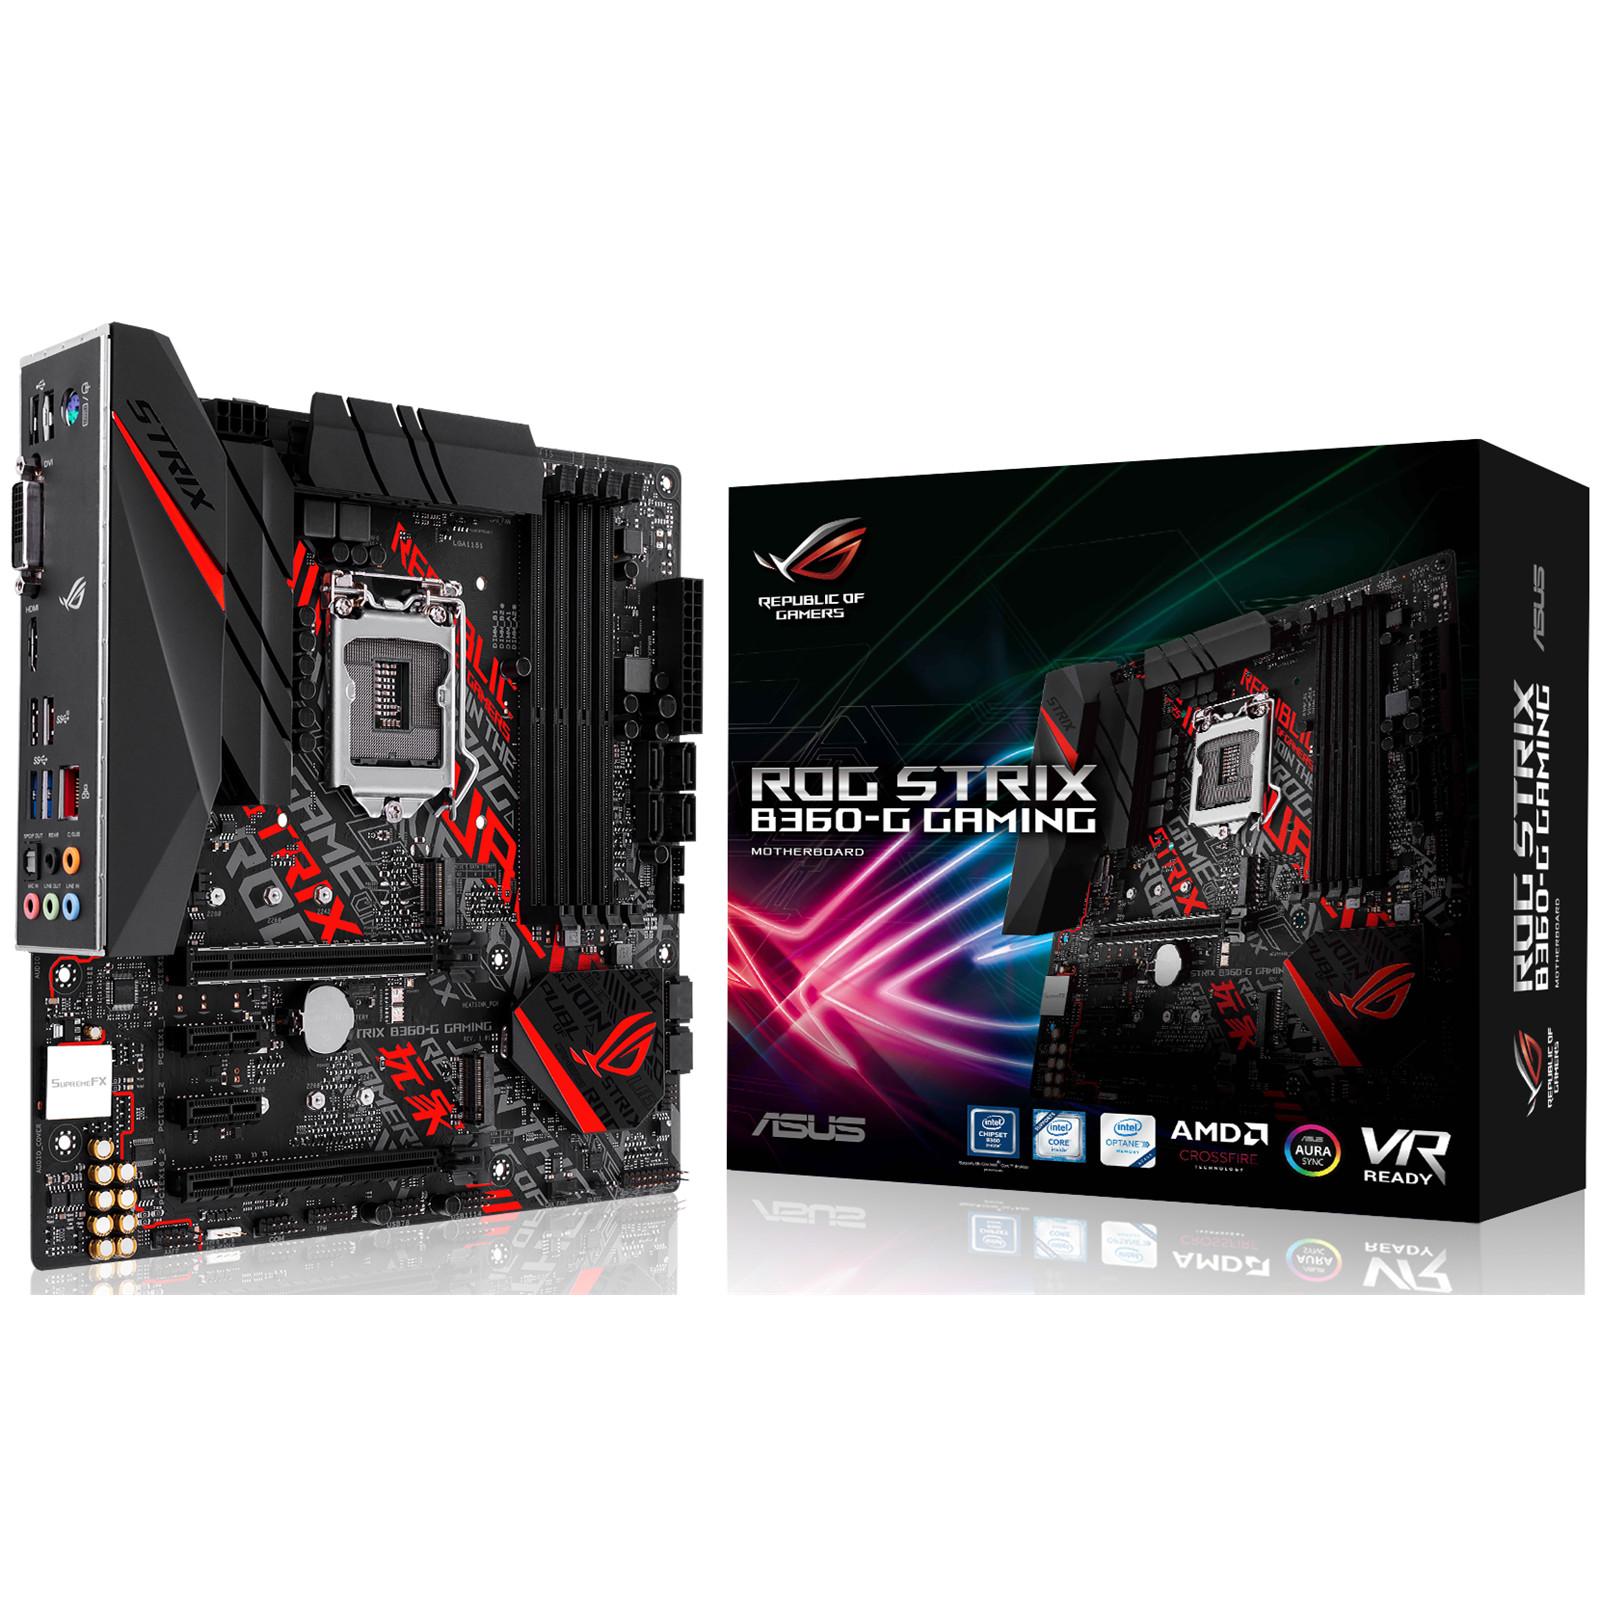 Buy The Asus Rog Strix B360 G Gaming Matx Form For Intel Coffee Multi Core X8 4x Super Fans Upto 17 Deepcool Notebook Cooler Lake Lga1151 Chipset Ddr4 2666 2x M2 Usb 31 Gen2 Hdmi Dvi